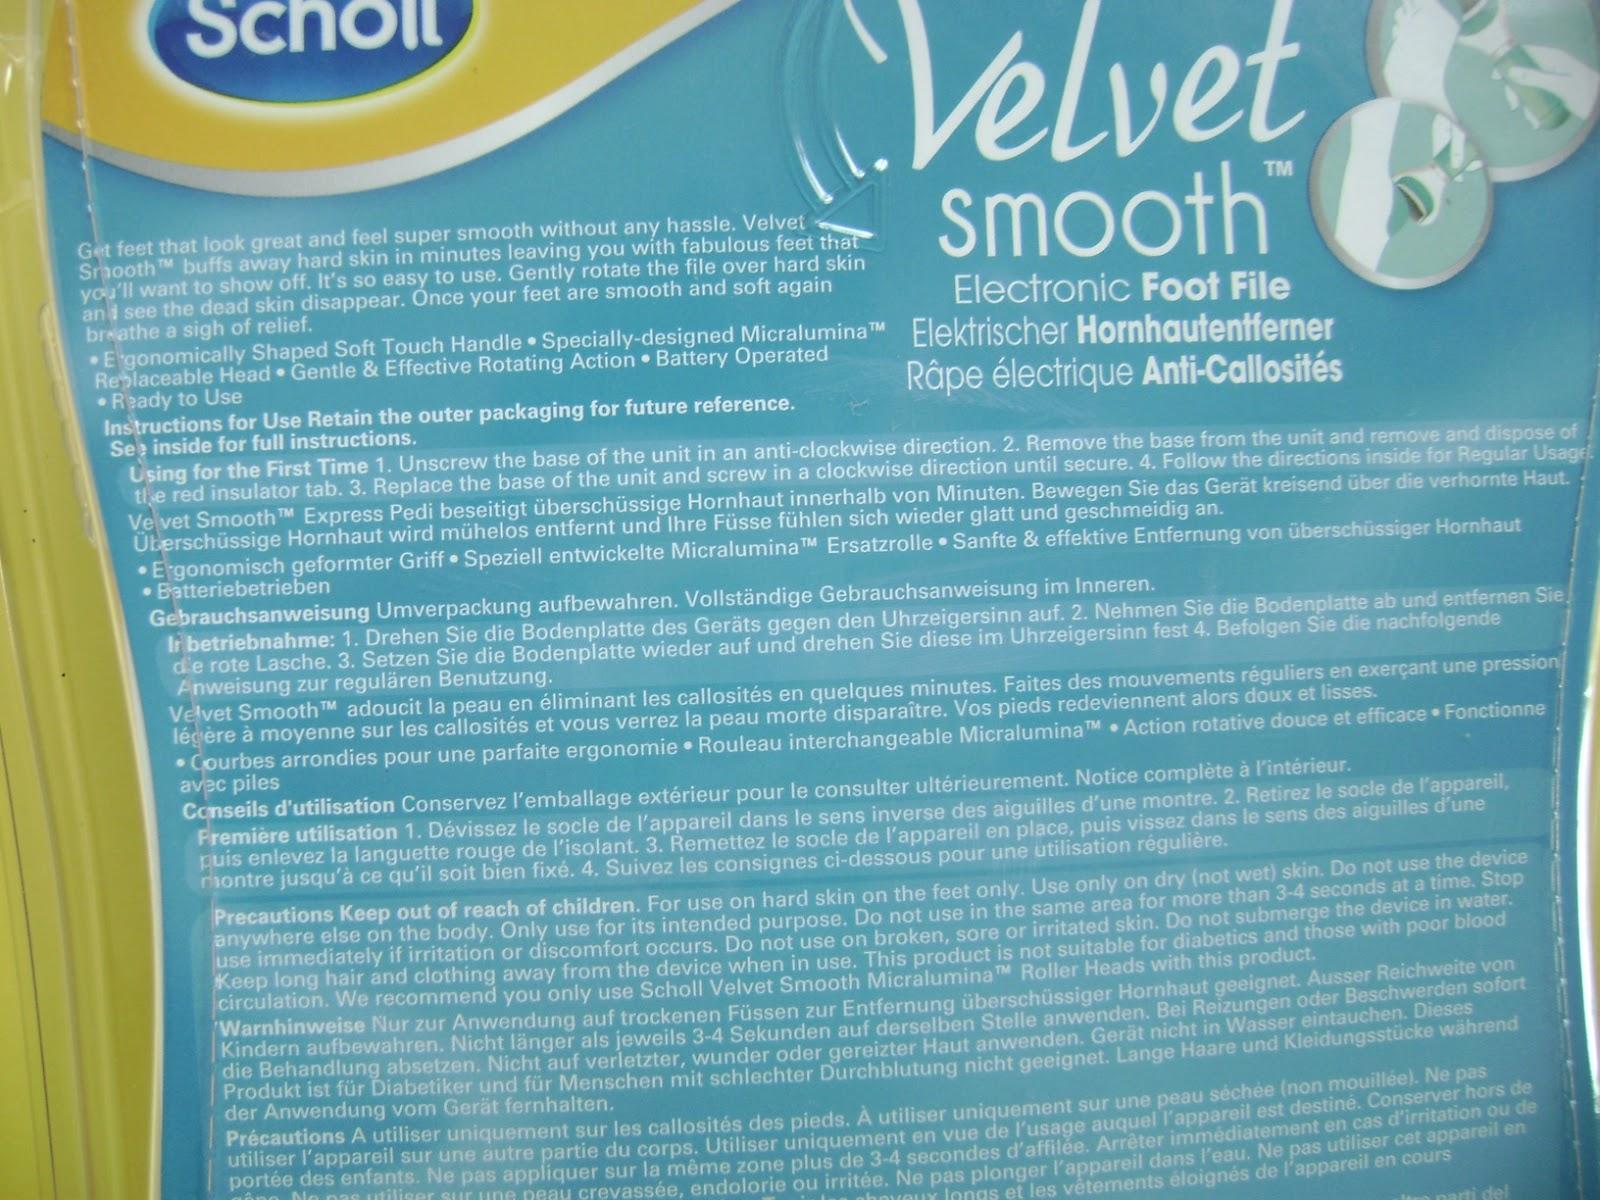 scholl velvet smooth express pedi electronic foot file